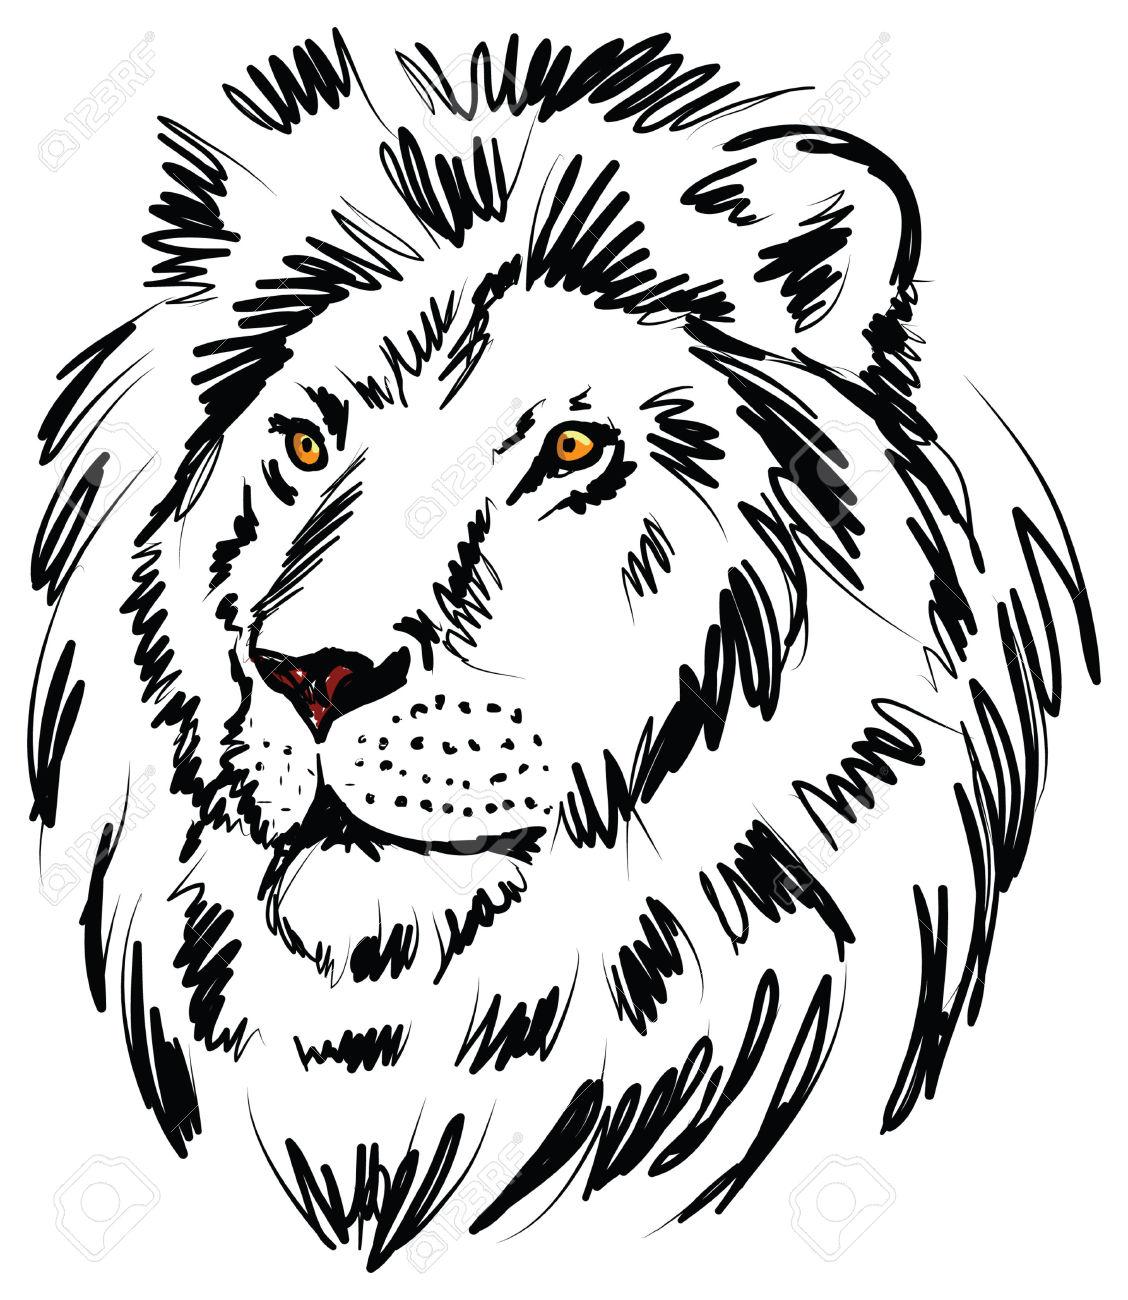 Lion Head Drawing At Getdrawings